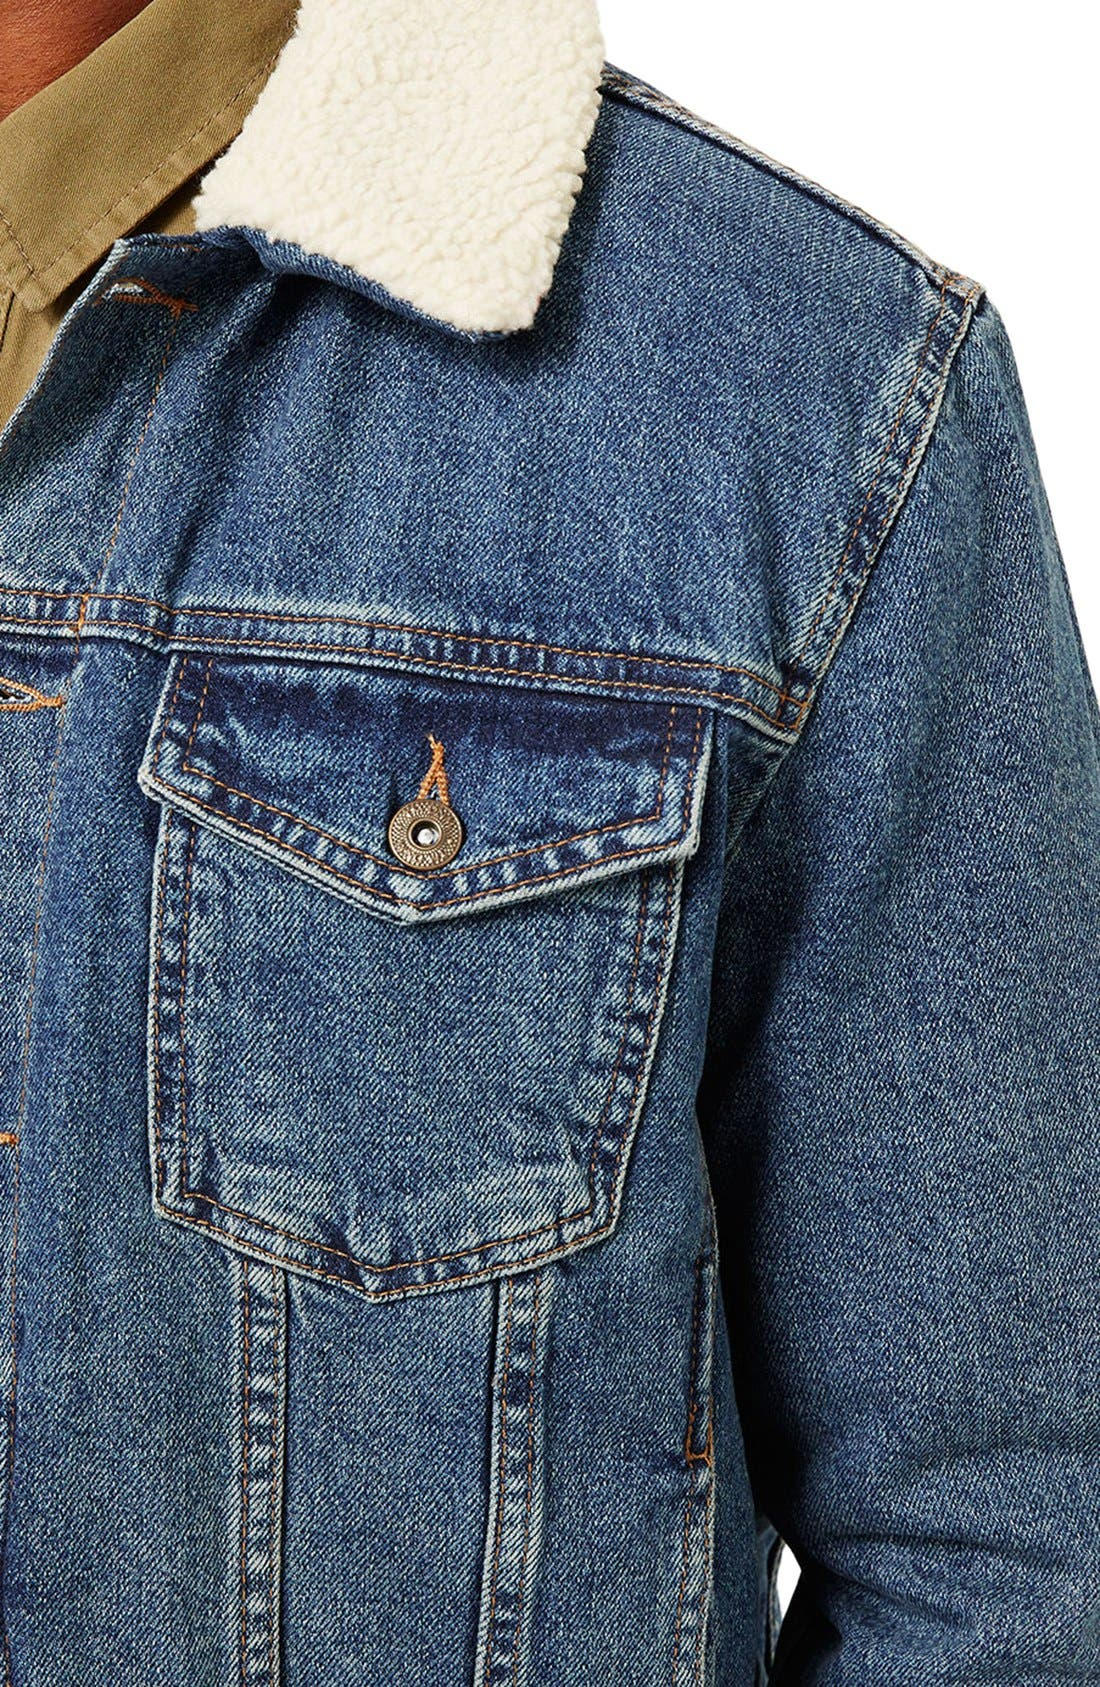 Borg Denim Jacket,                             Alternate thumbnail 4, color,                             400